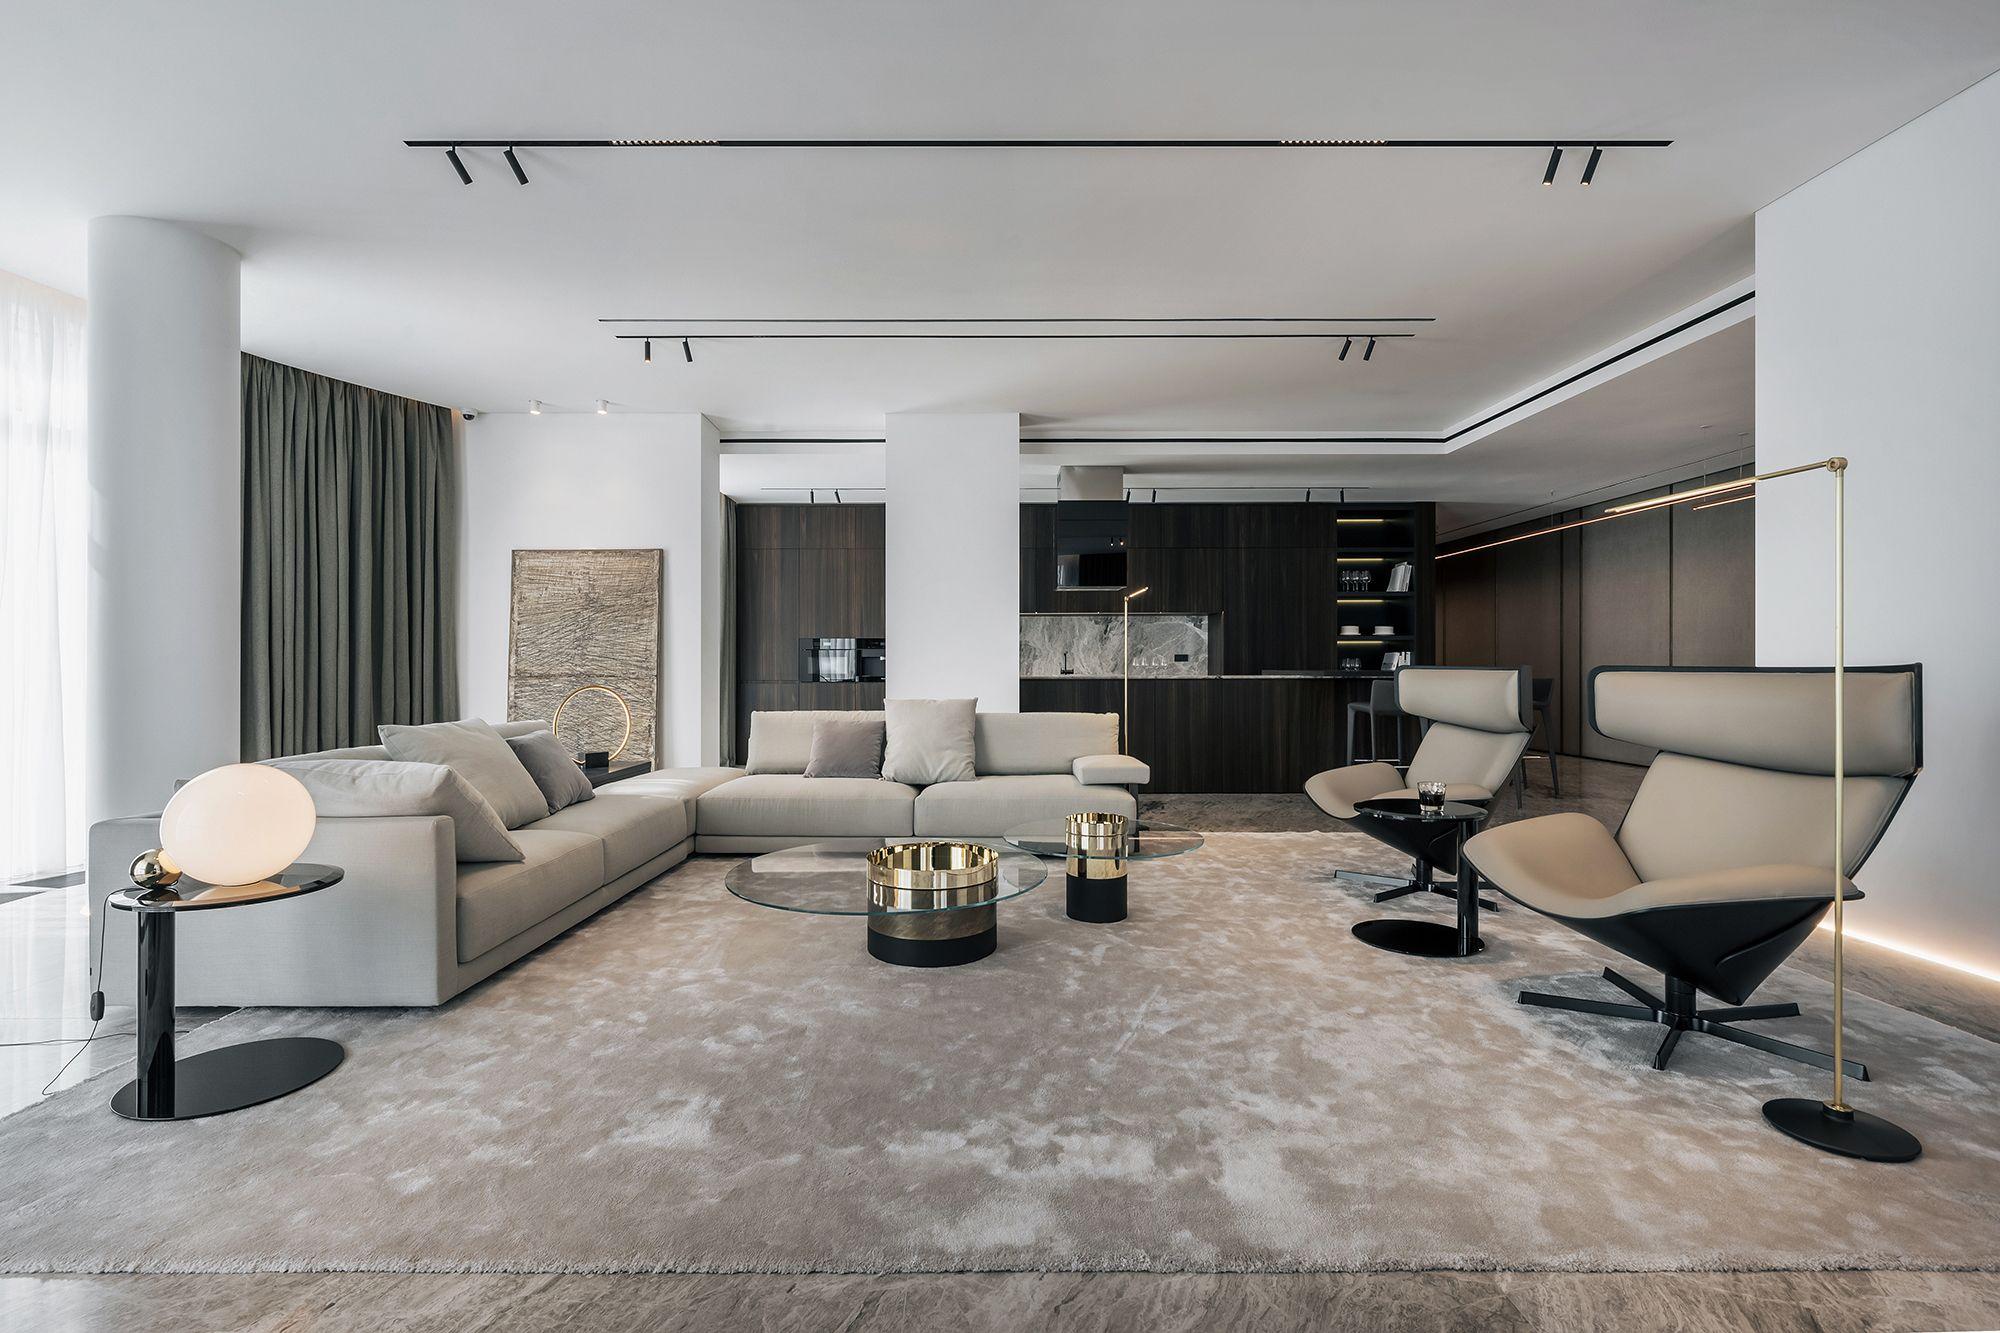 Enter A New Level Of Luxury Ydzn Living Room Design Decor Living Room Design Modern Home Room Design Elegant minimalist luxury room